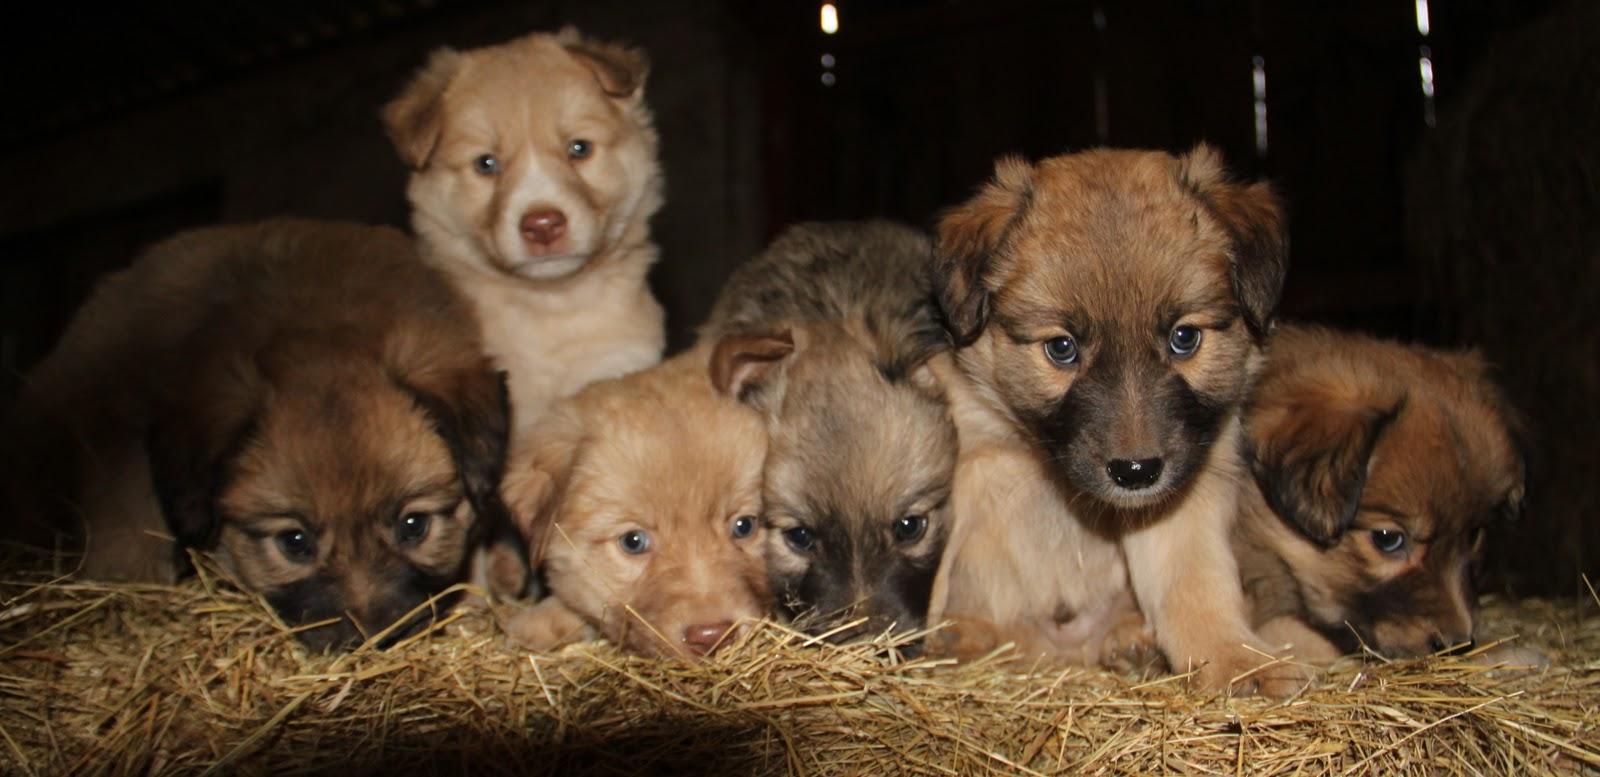 Basque Shepherd Puppies: Basque Puppies In Sheepbarn Breed